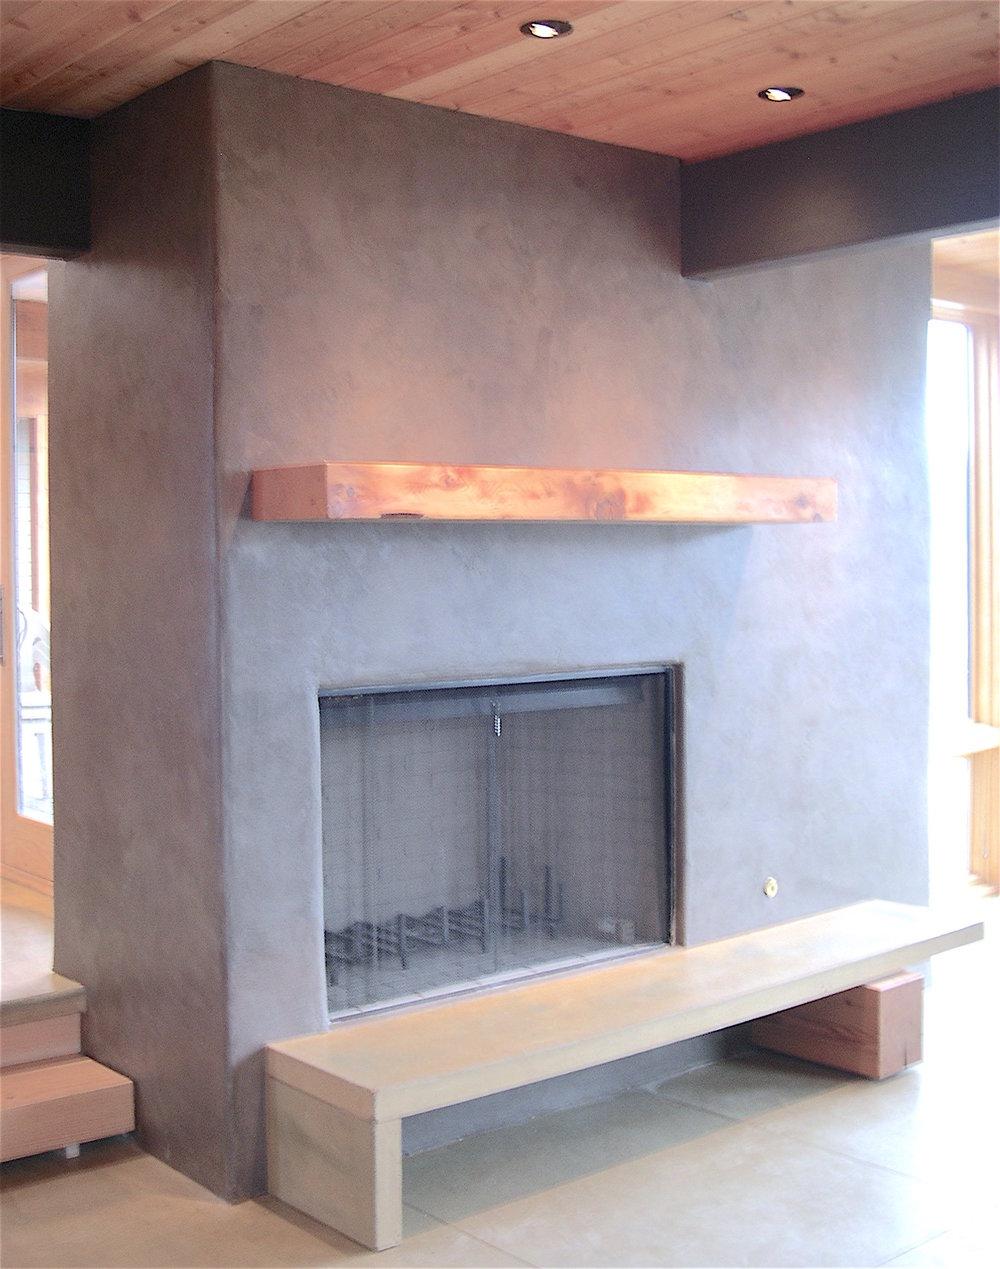 HR Int fireplace.jpg